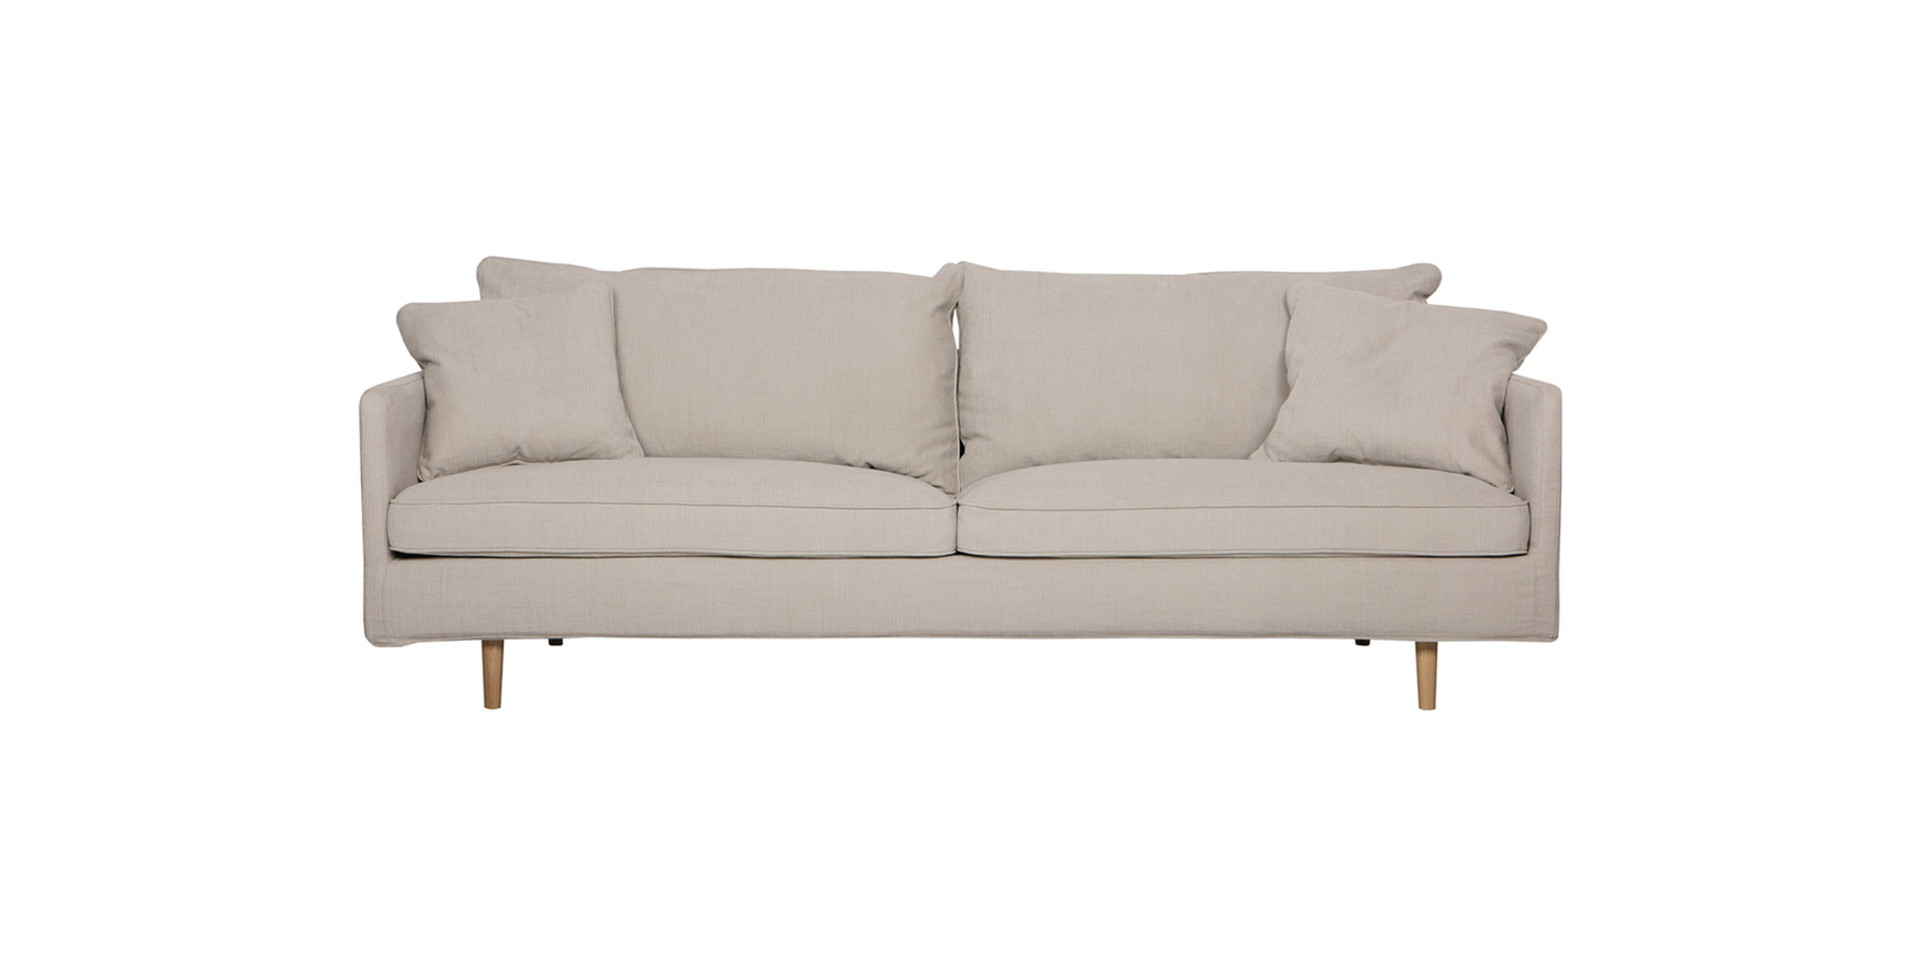 JULIA_3seater_big_cushions_caleido3790_light_beige_1